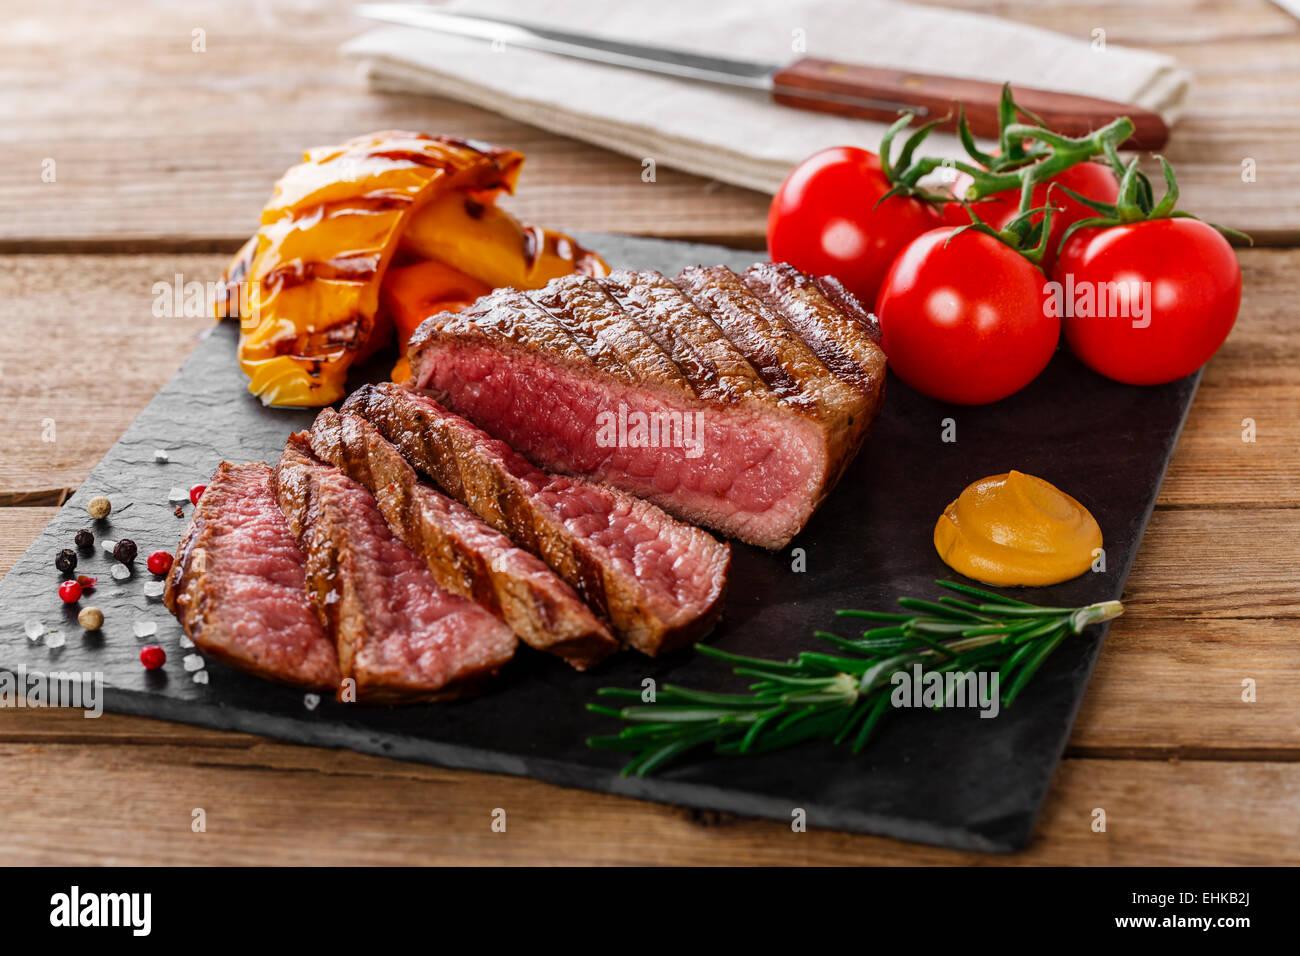 Grigliate di carne di manzo tagliata a fette rare con verdure Immagini Stock